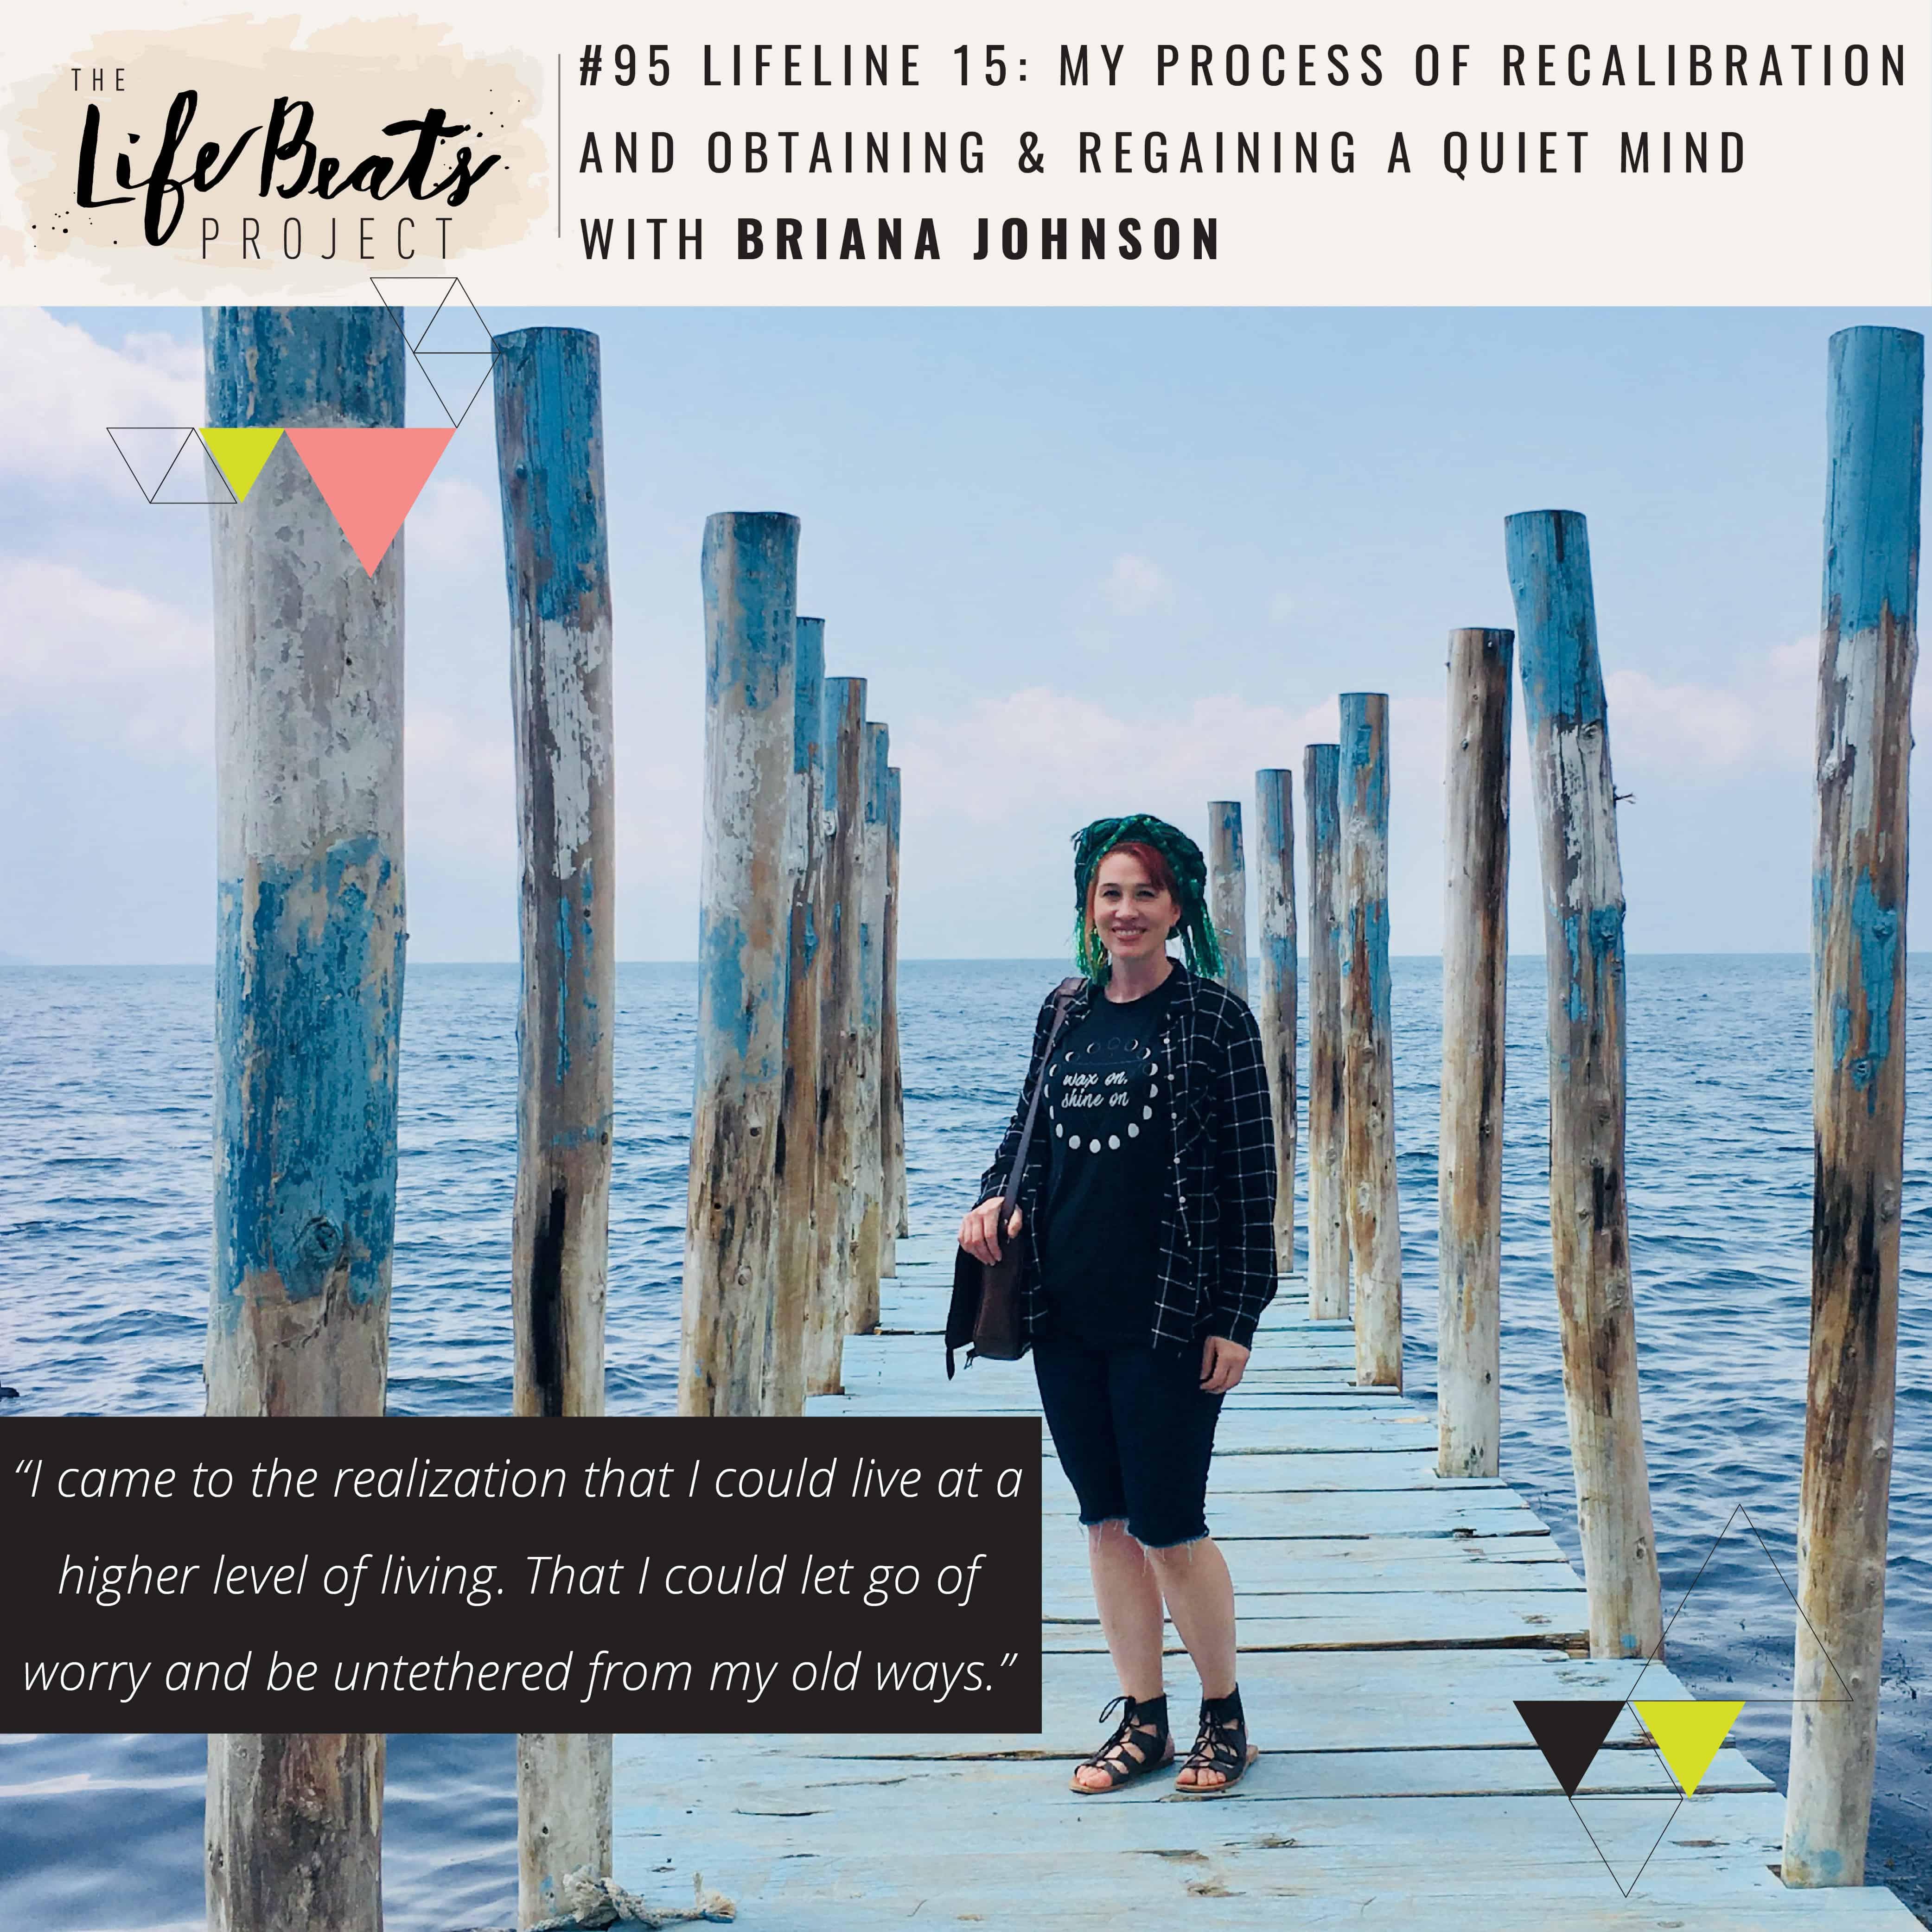 recalibration quiet mind peace trust in God undaunted standard calibration process podcast LifeBeats Guatemala Cultiva International Greg Jensen